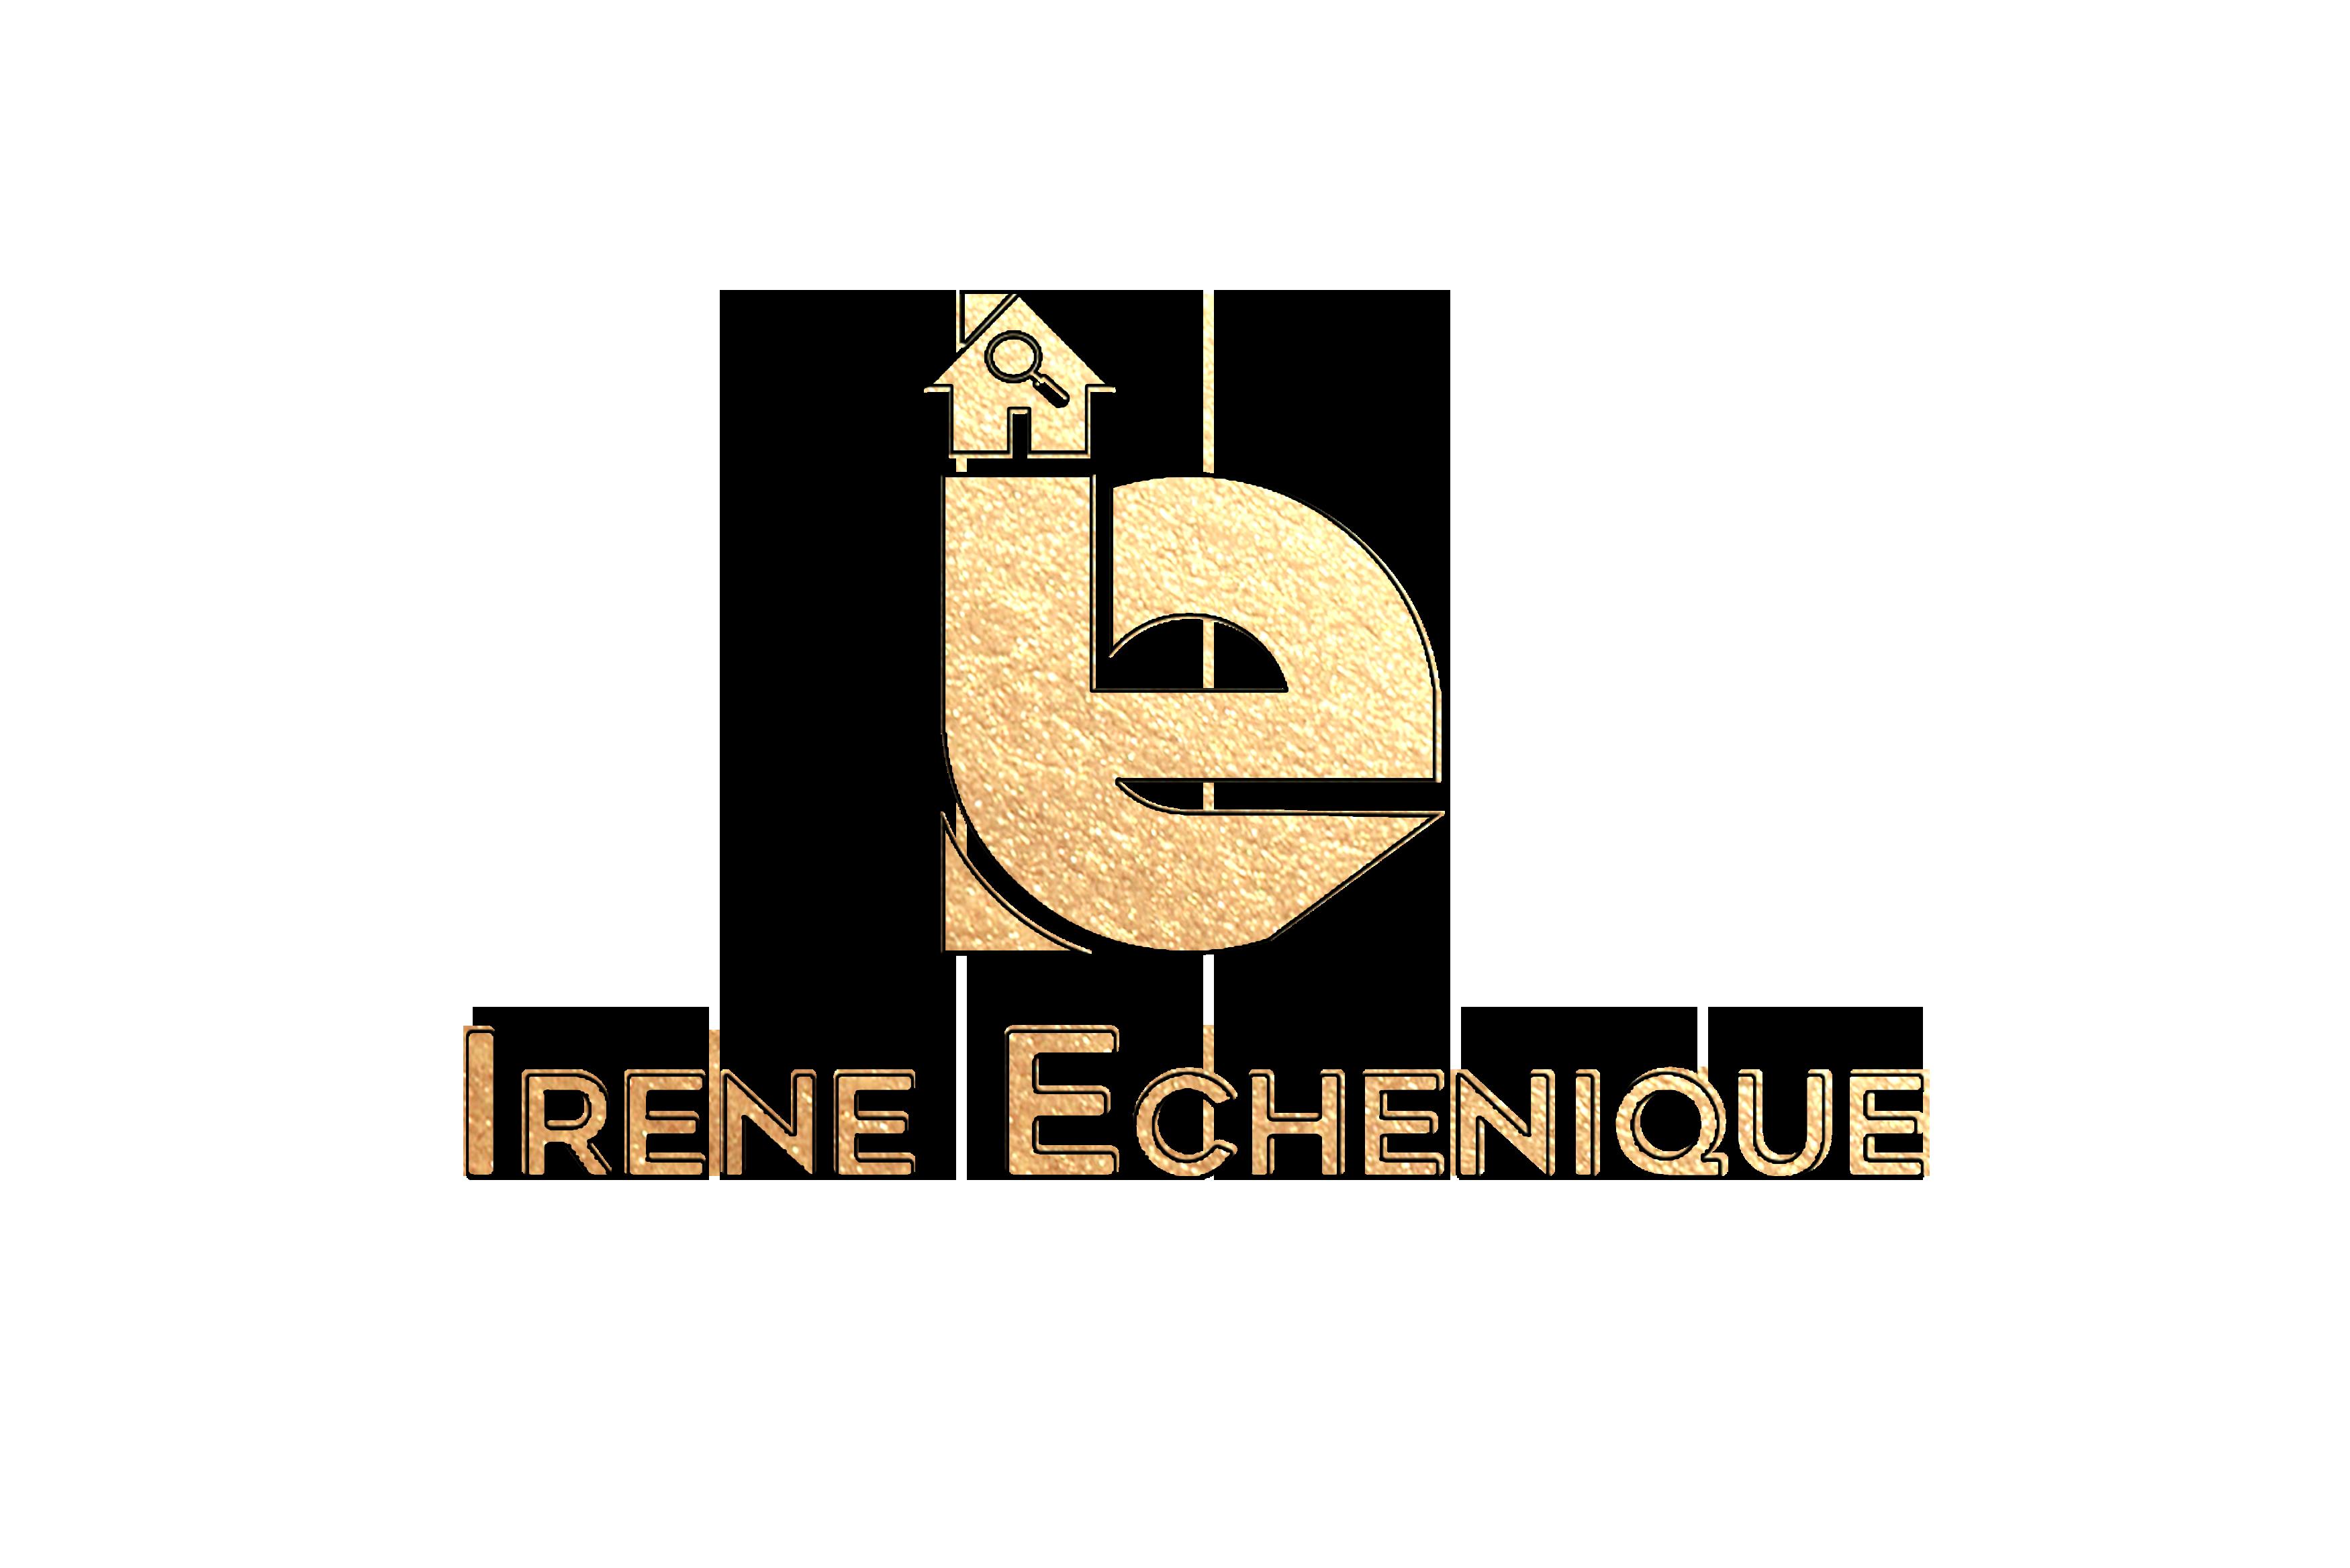 Irene Echenique, Logo, Homes, Listing agent, Agent, sell, Homes